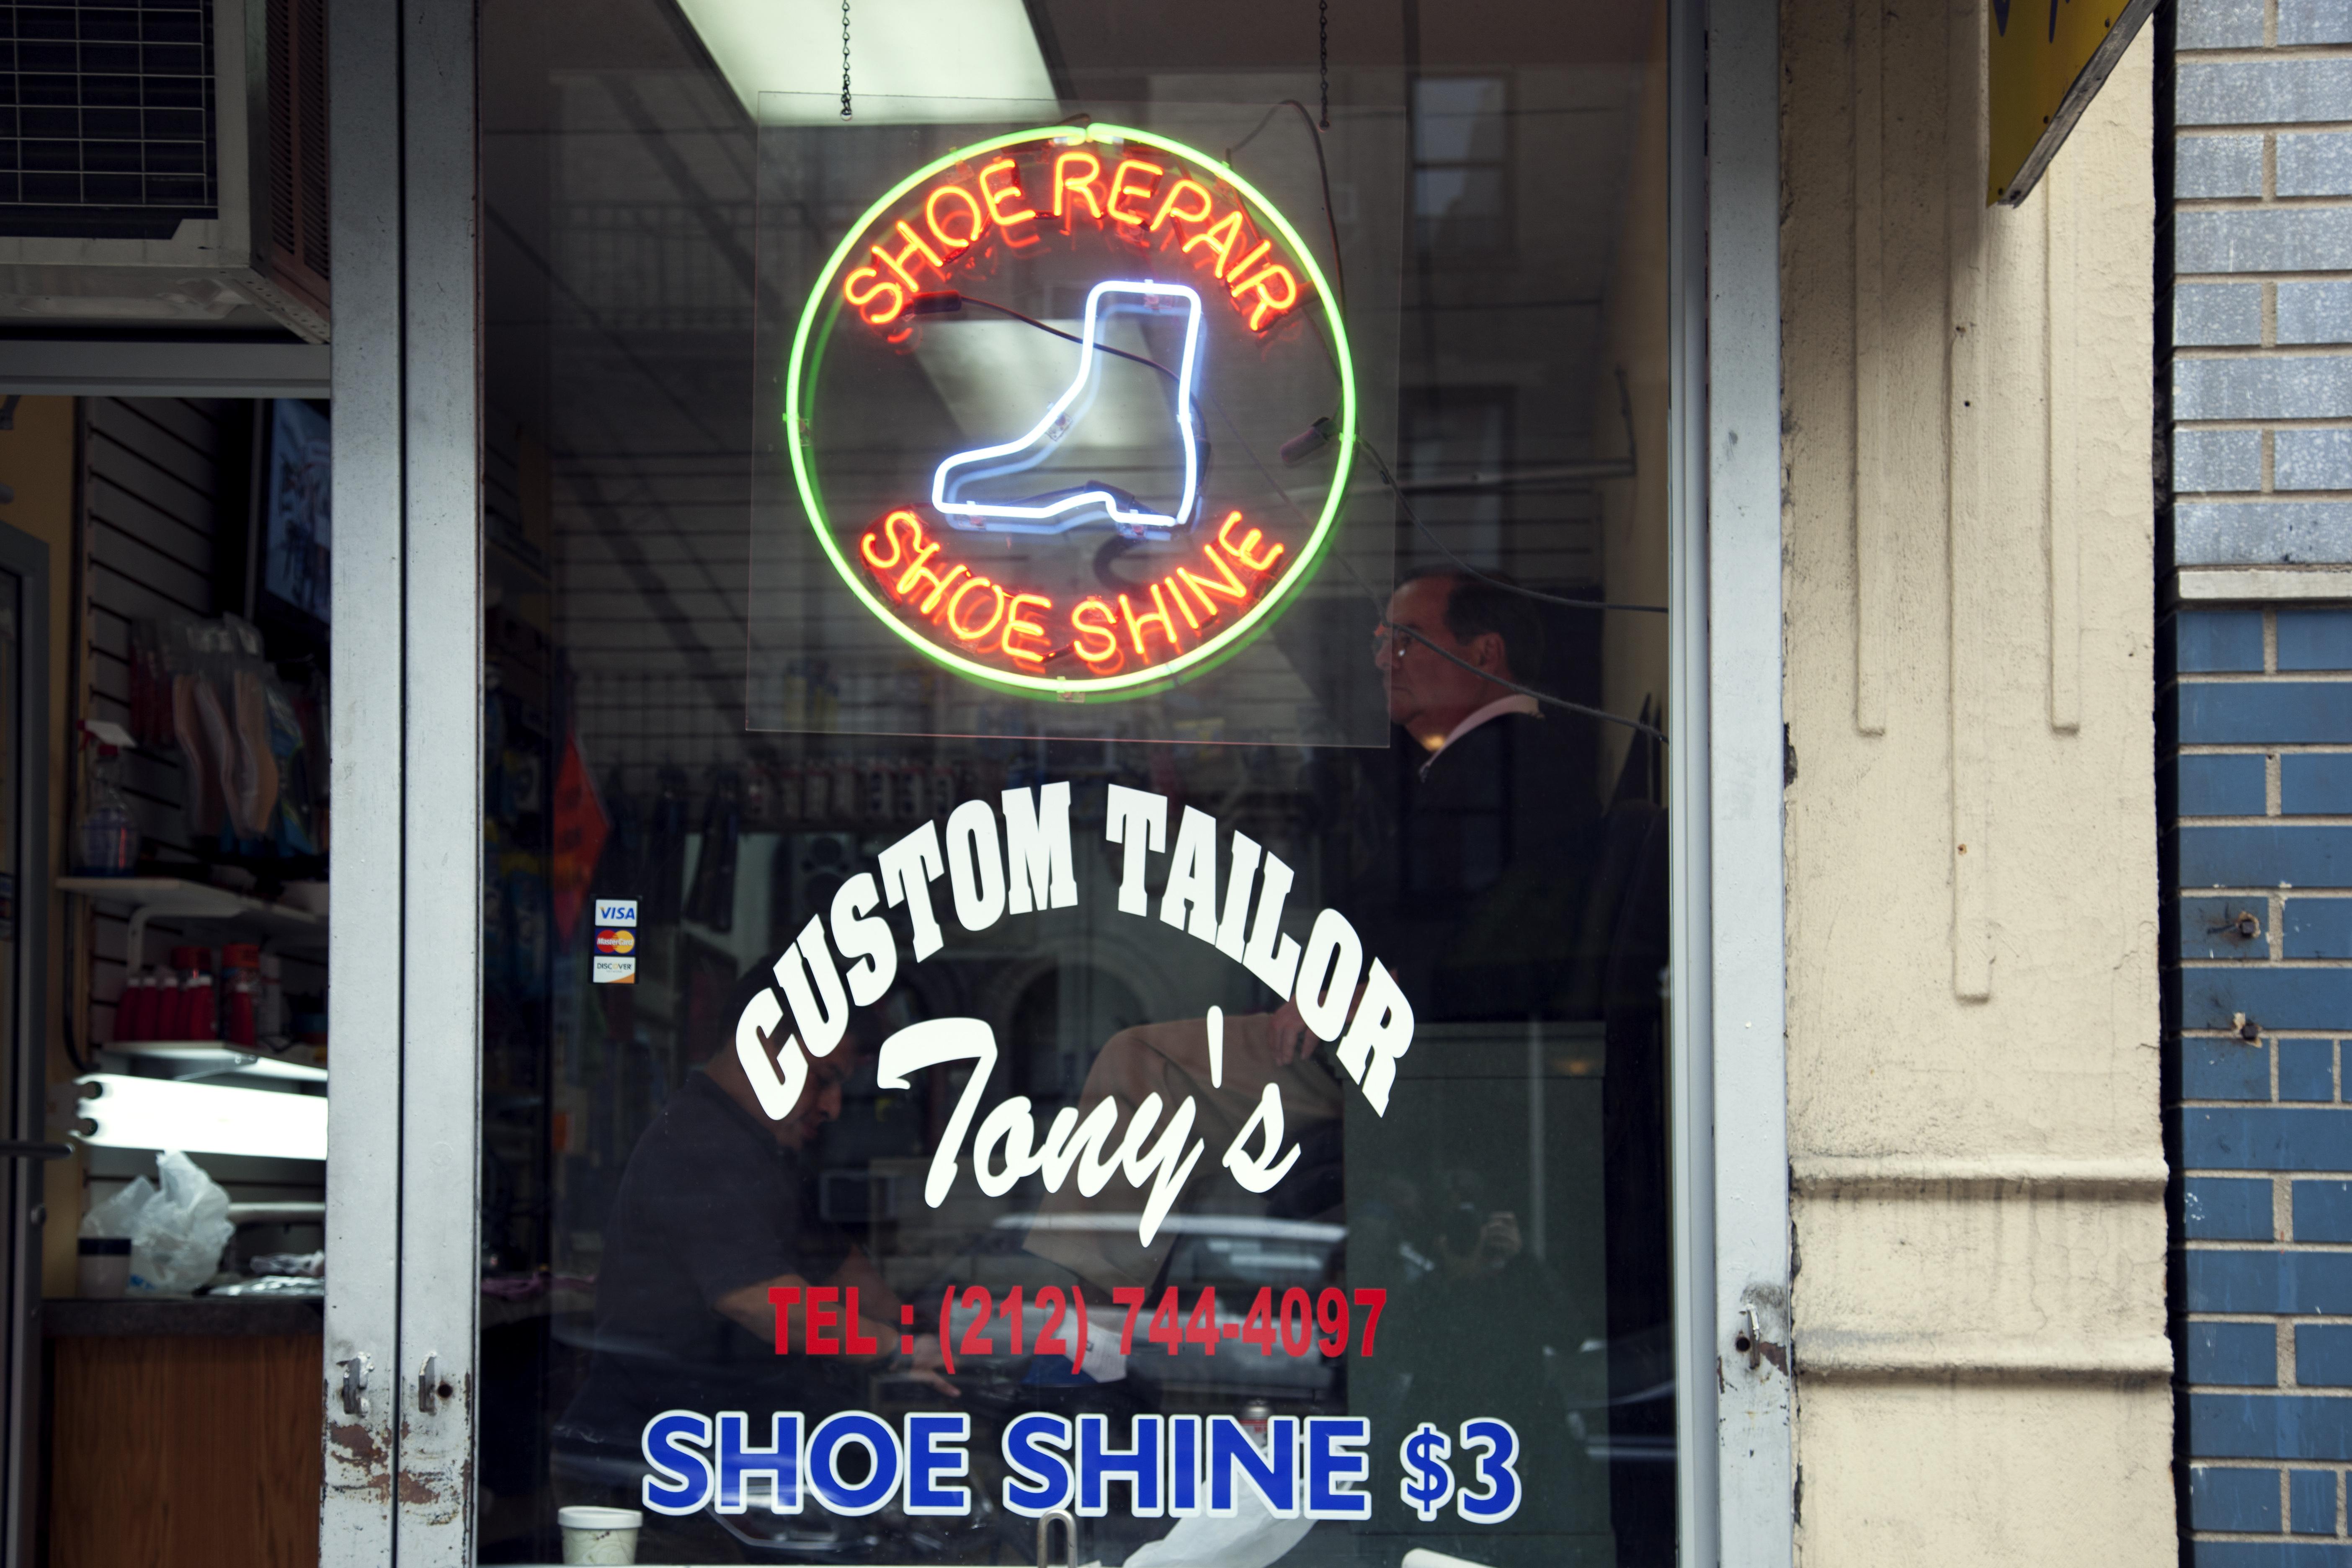 Tony's shoe shine